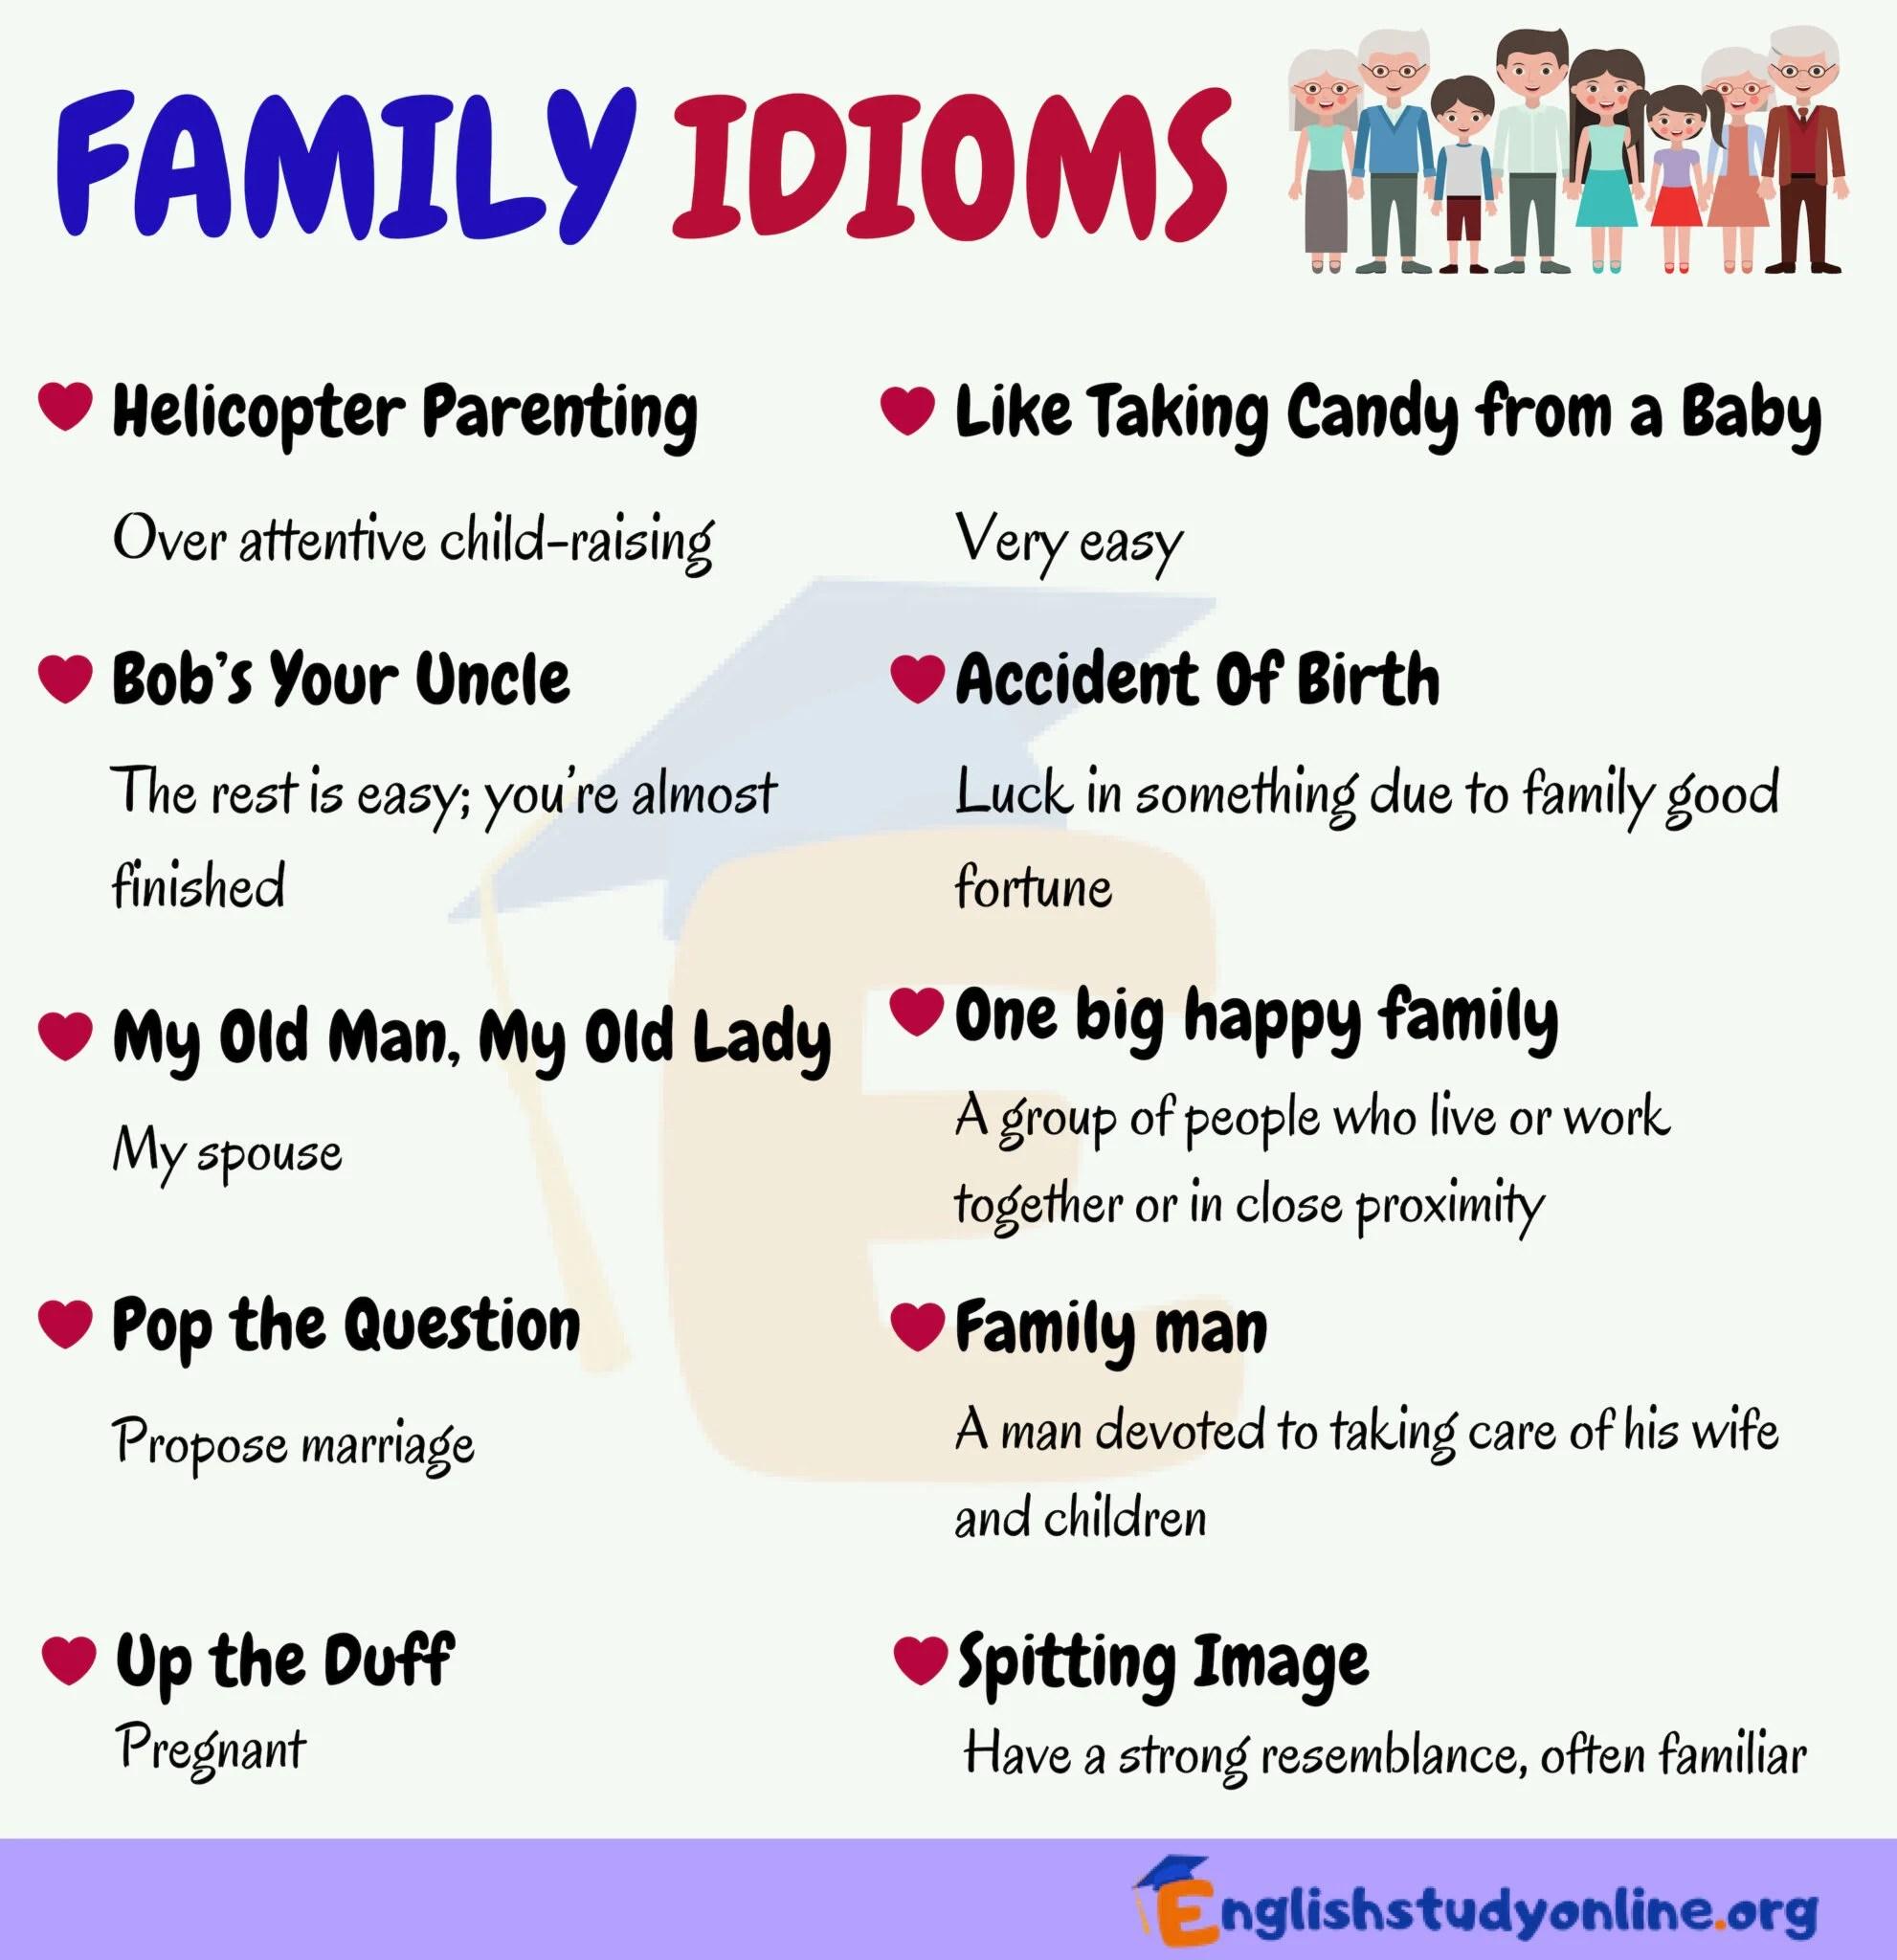 Family Idioms